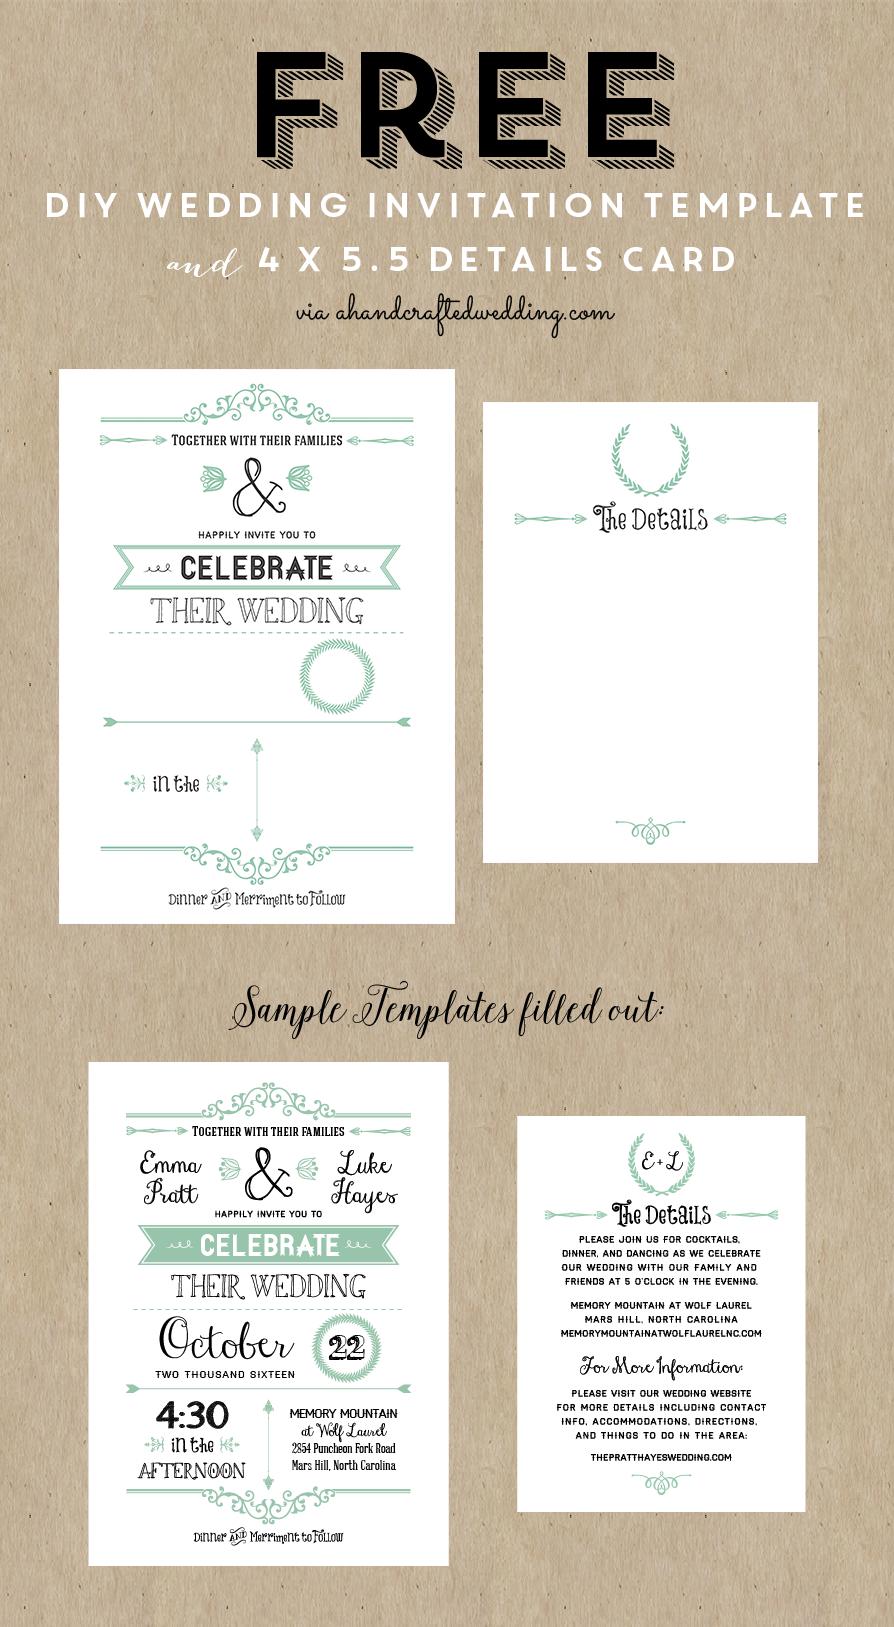 Free Printable Wedding Invitation Template | Wedding | Free Wedding - Free Printable Wedding Inserts